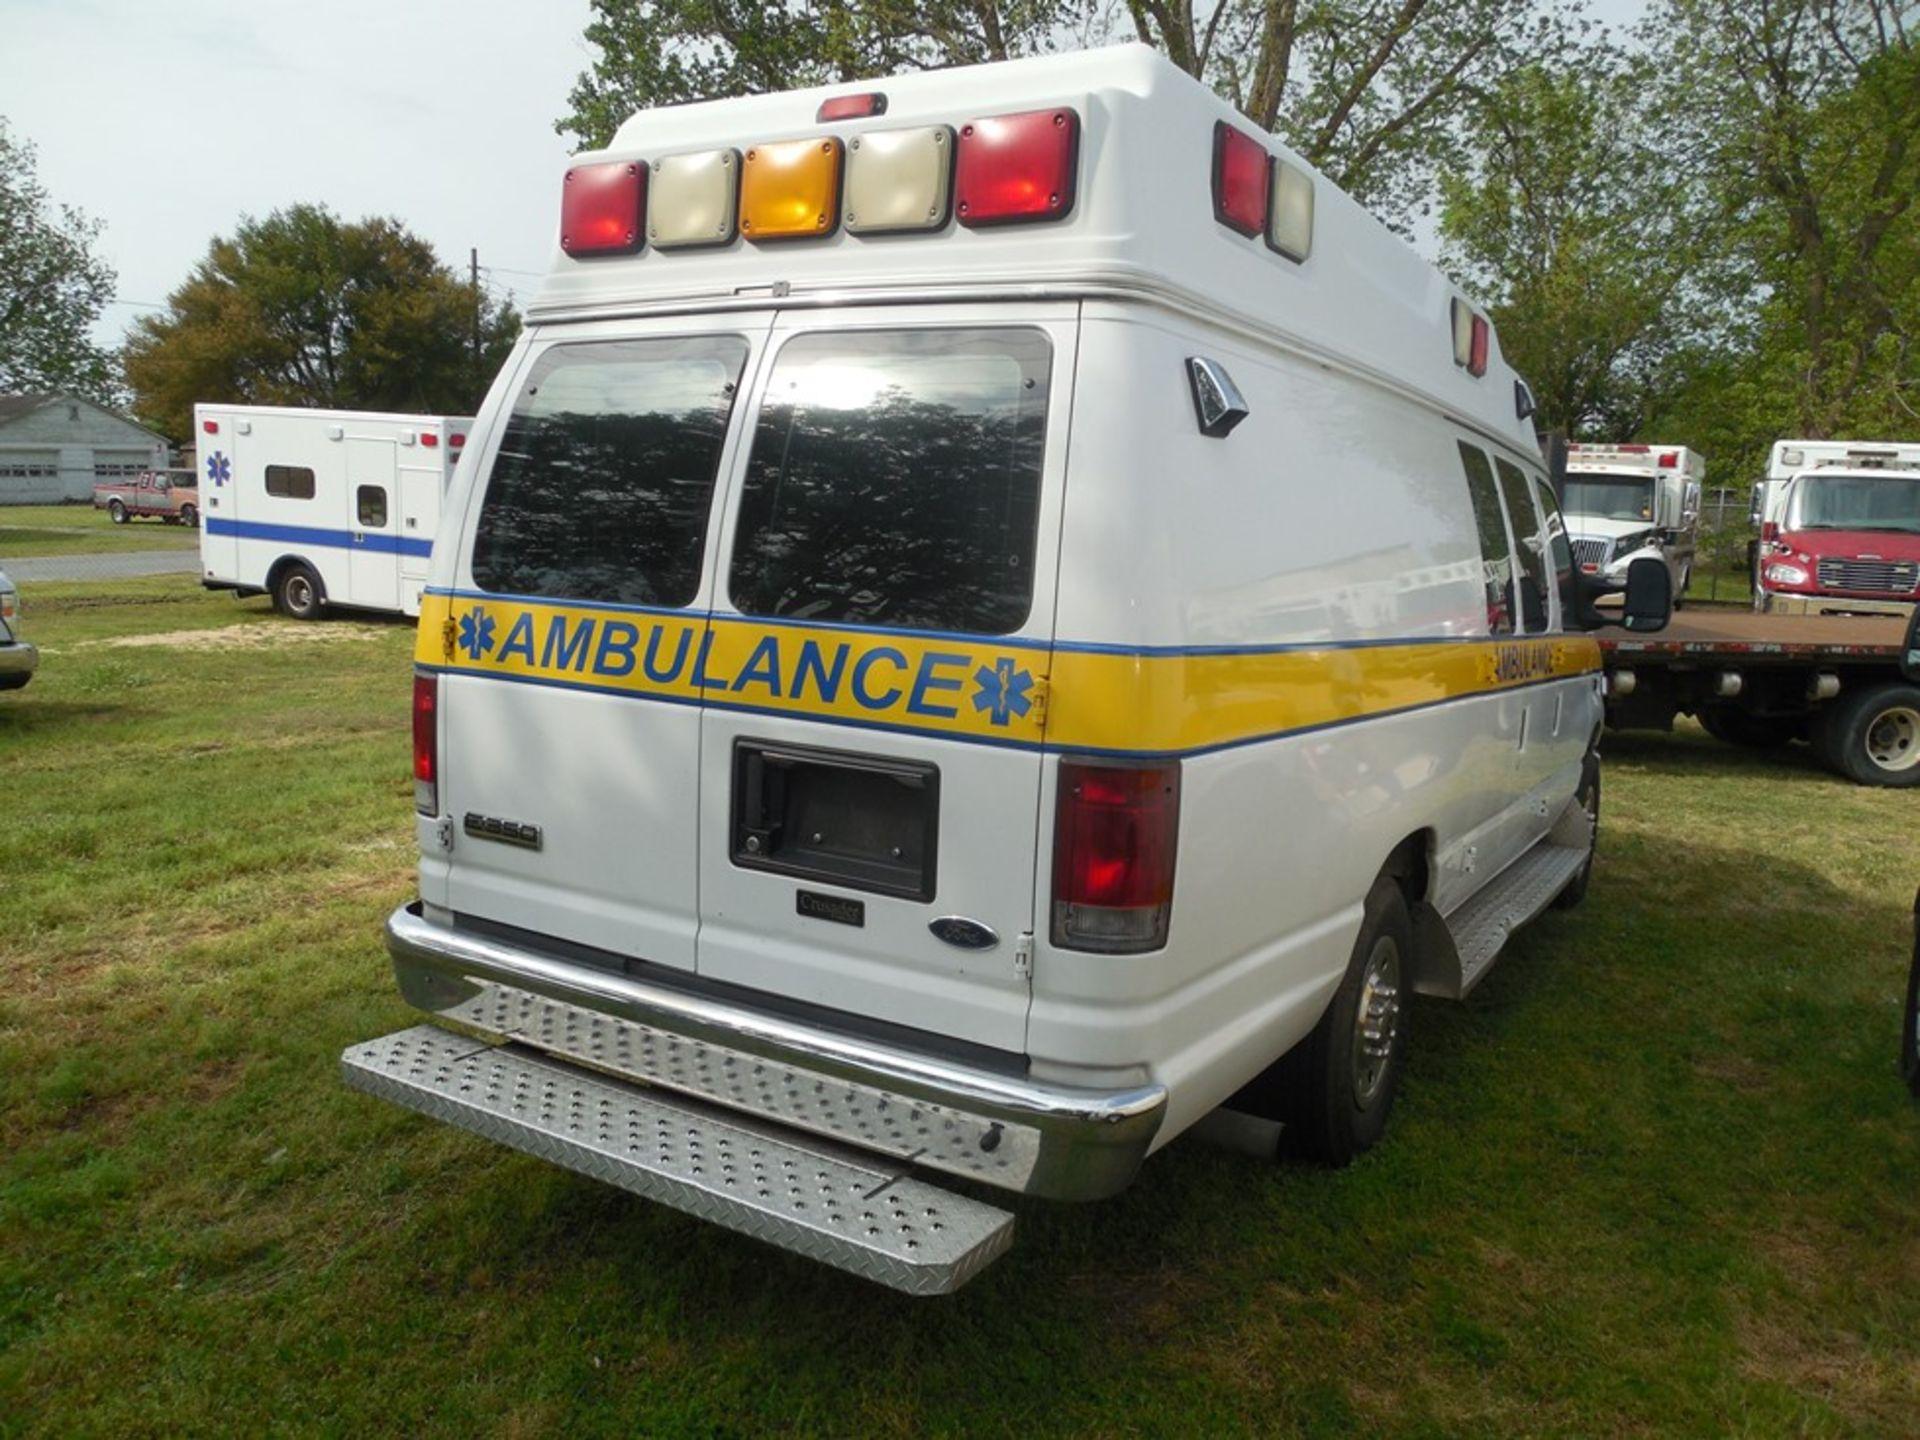 2010 Ford E350 Crusader Wheel Coach van ambulance 214,465 miles vin# 1FDSS3EP9ADA32493 - Image 4 of 6